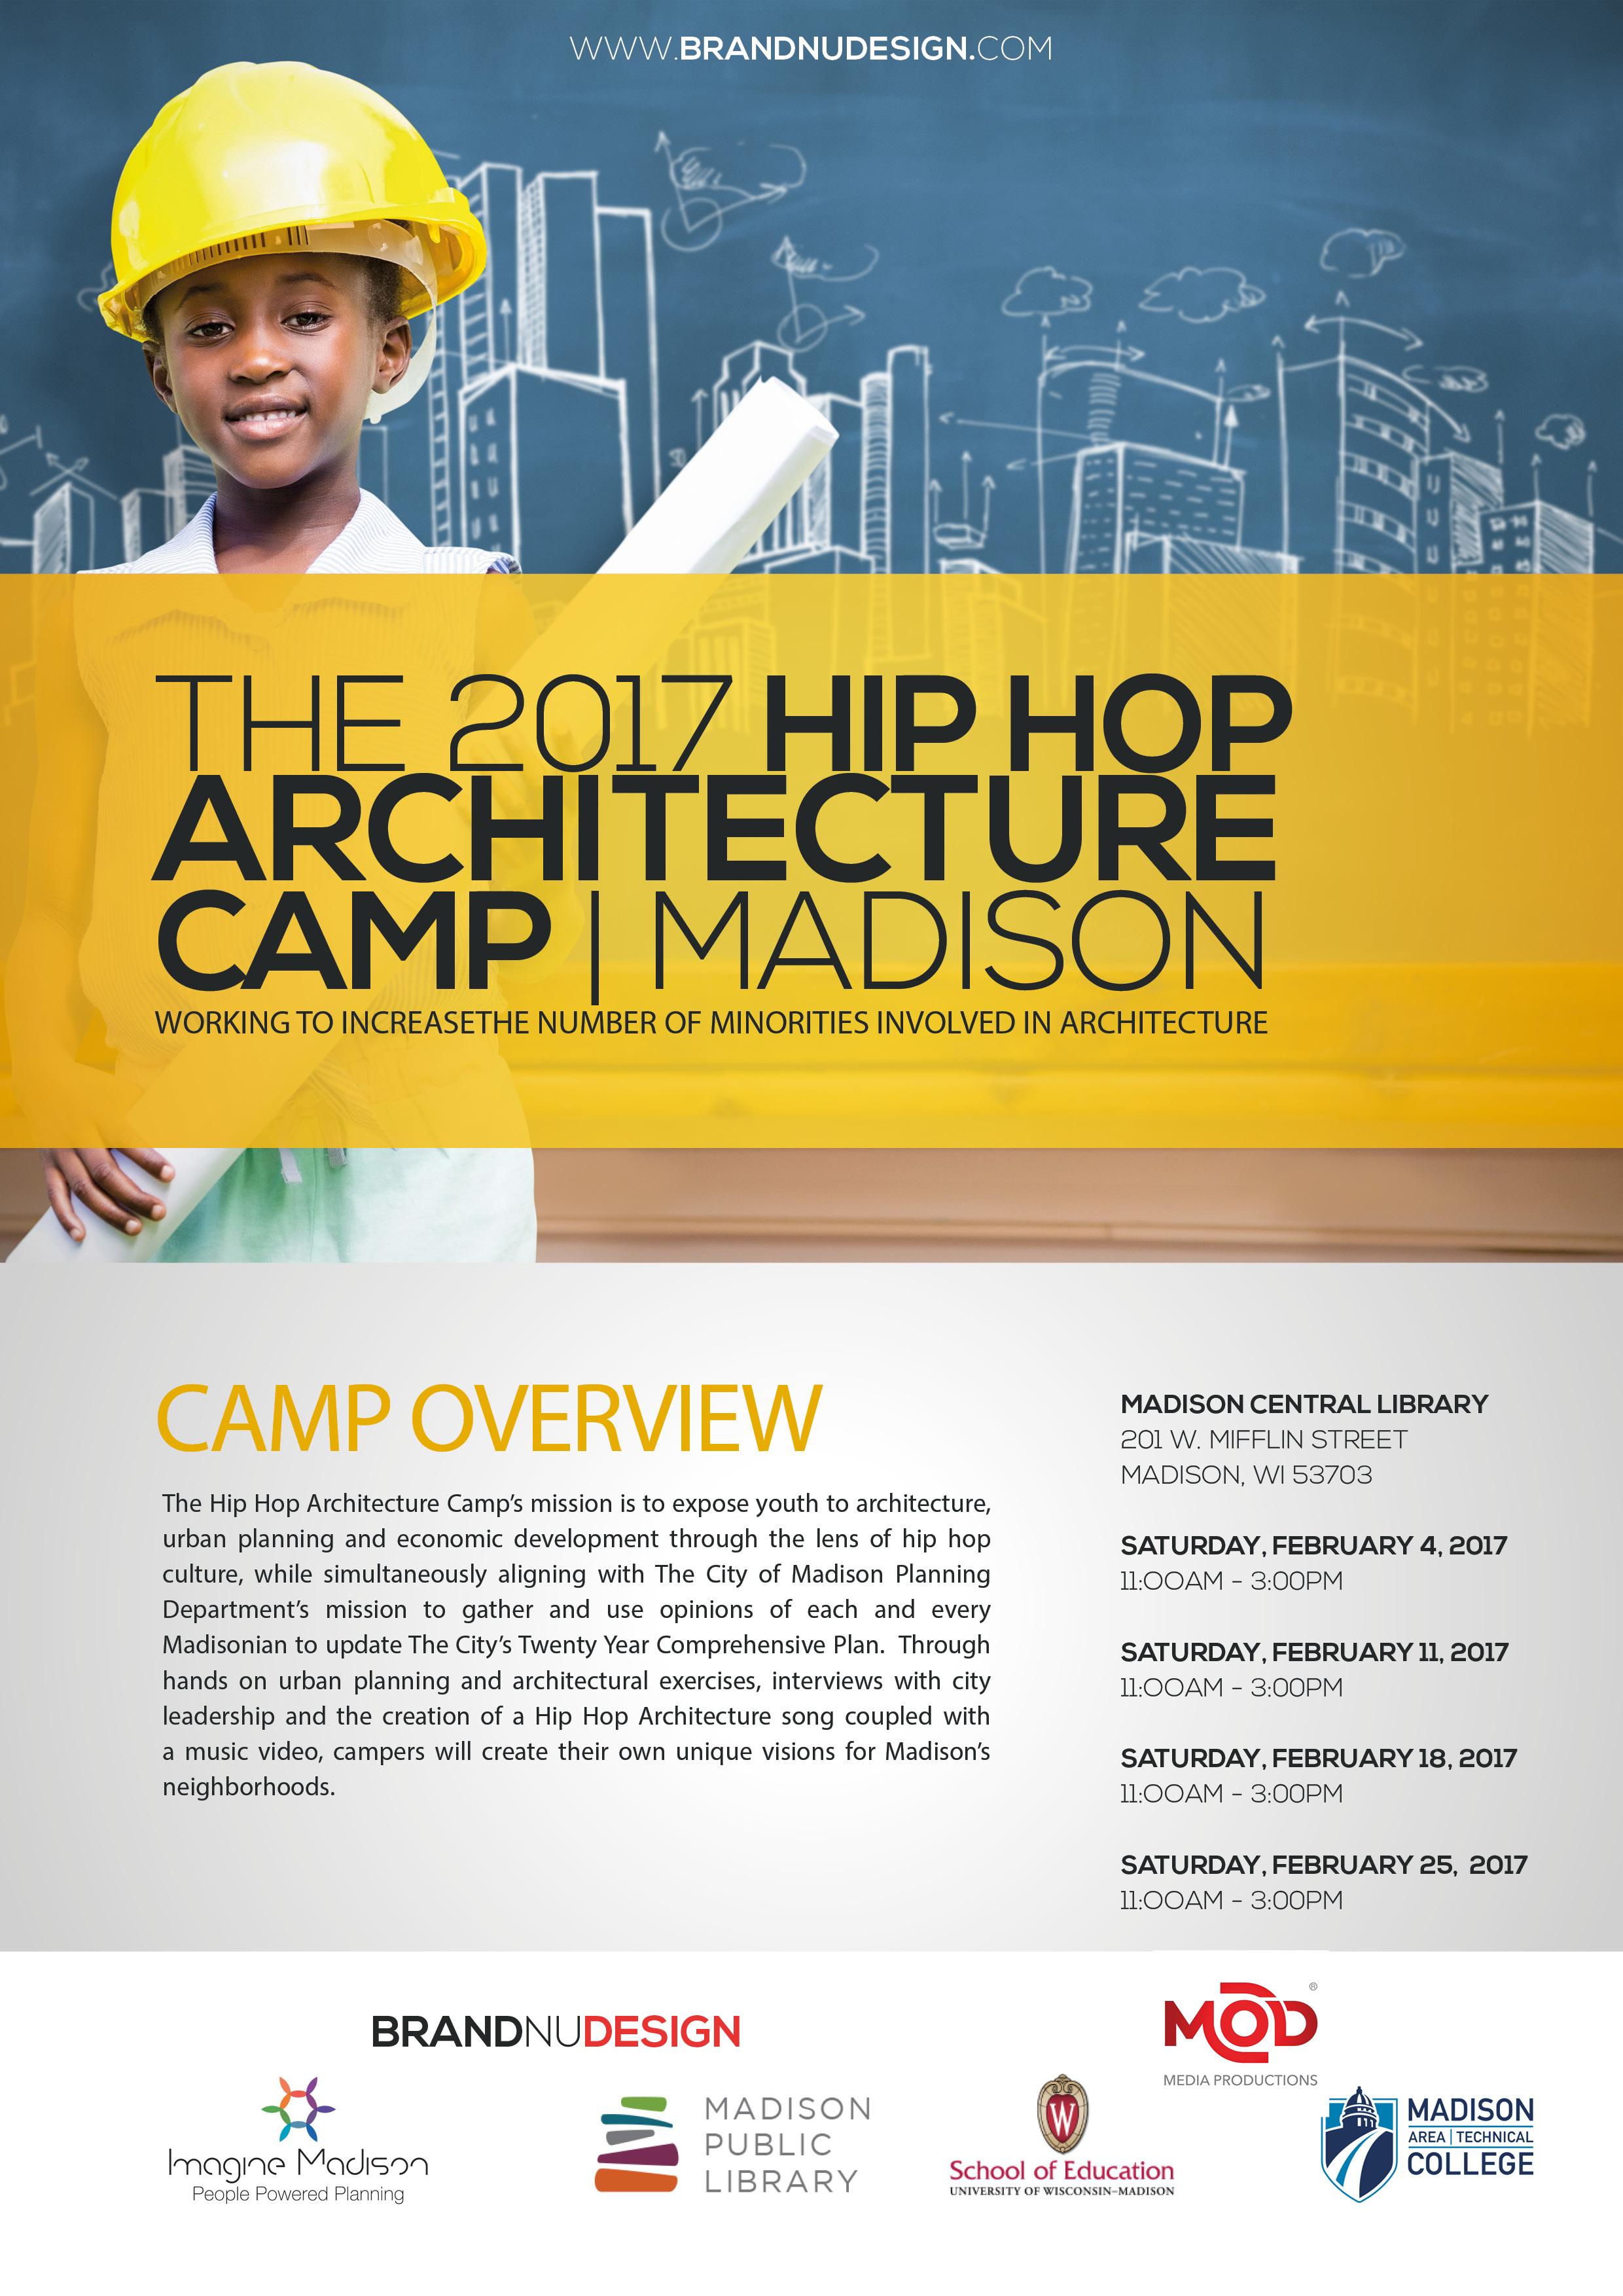 HipHopArchitectureCamp